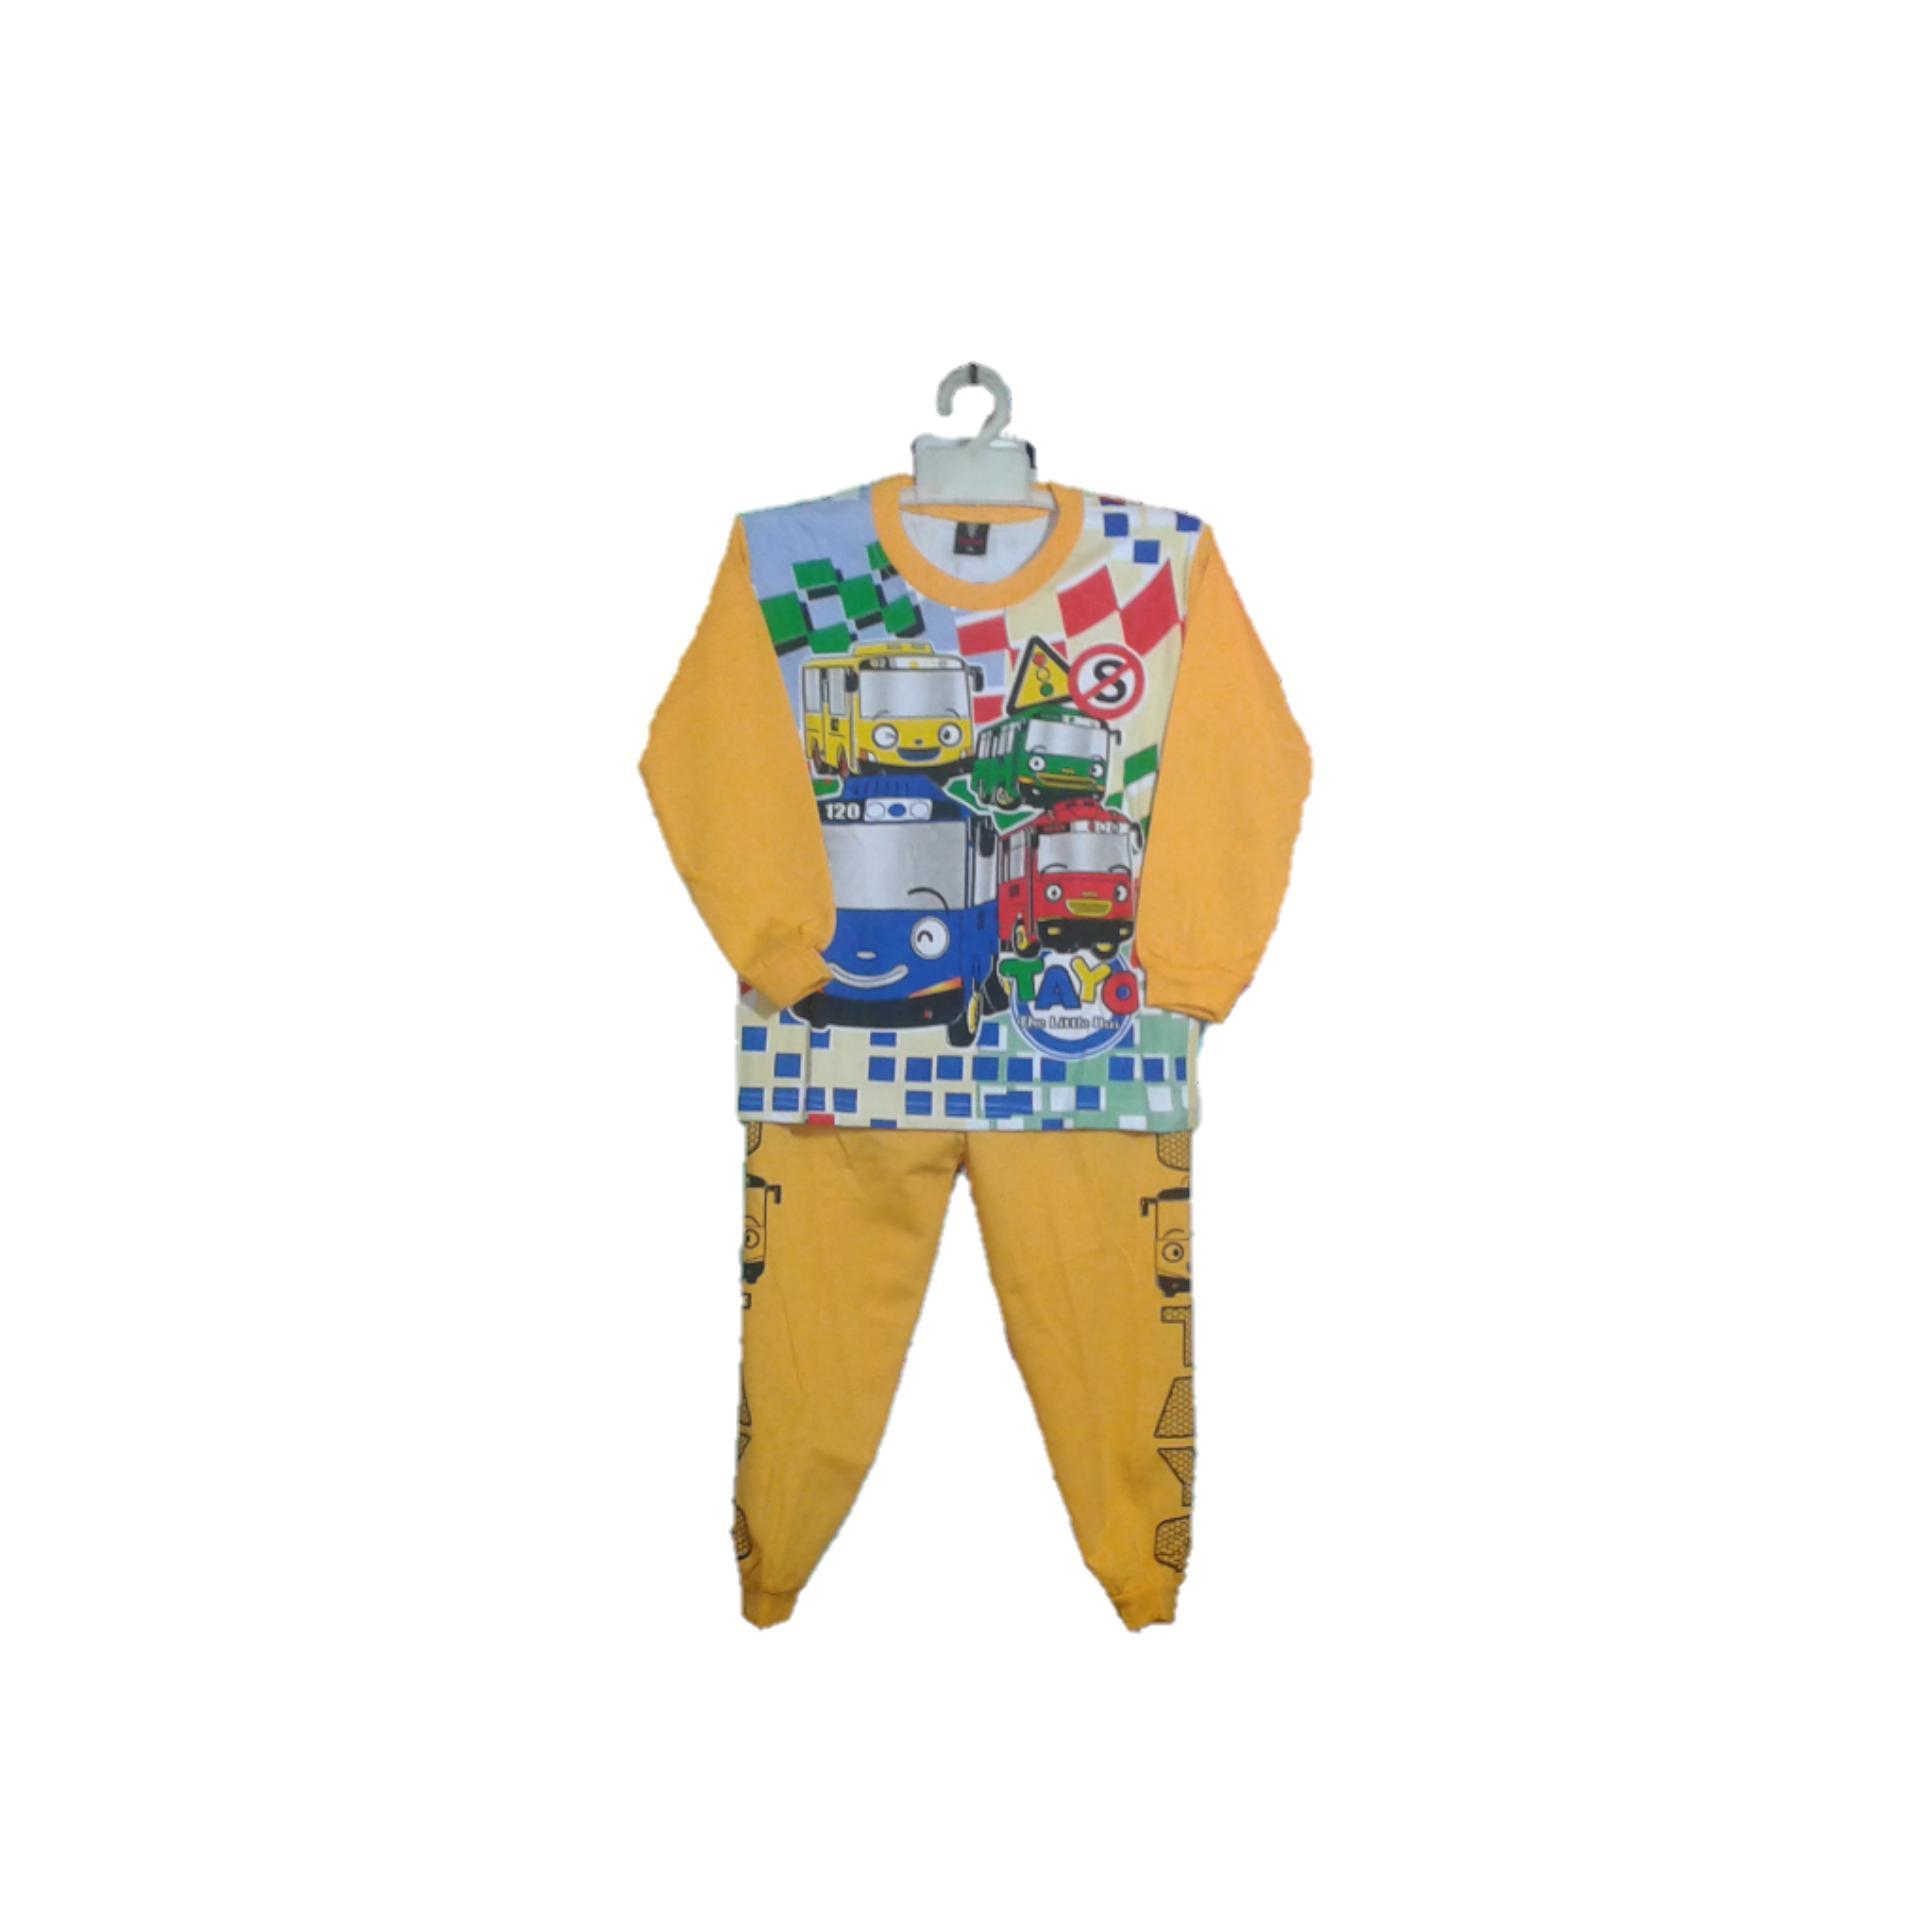 Pencarian Termurah Setelan Baju Tidur Tayo Pencari Harga Anak Laki Model Kaos Dan Celana Cocok Untuk Lebaran